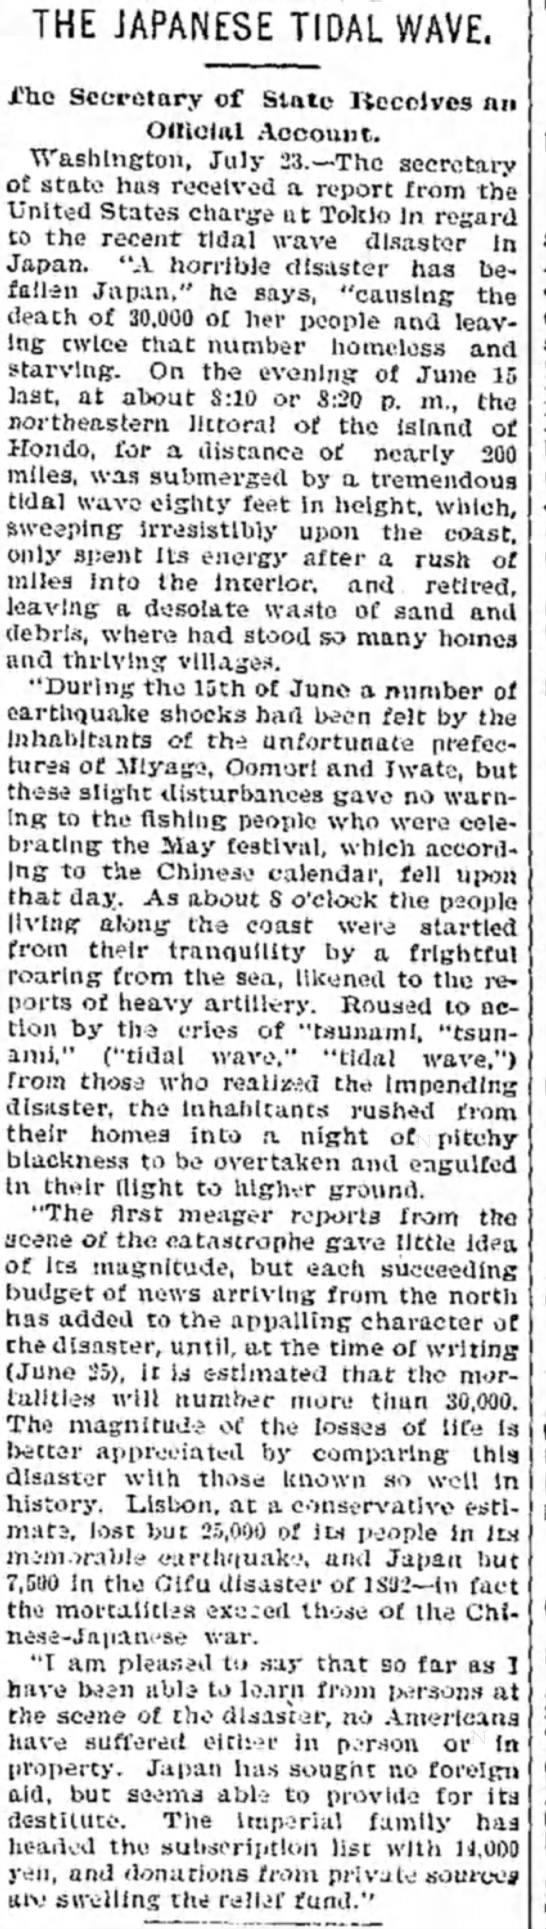 1896 Japan Tsunami article. - TMalmay - THE JAPANESETlDAL WAVE. i'he Secretary of State...